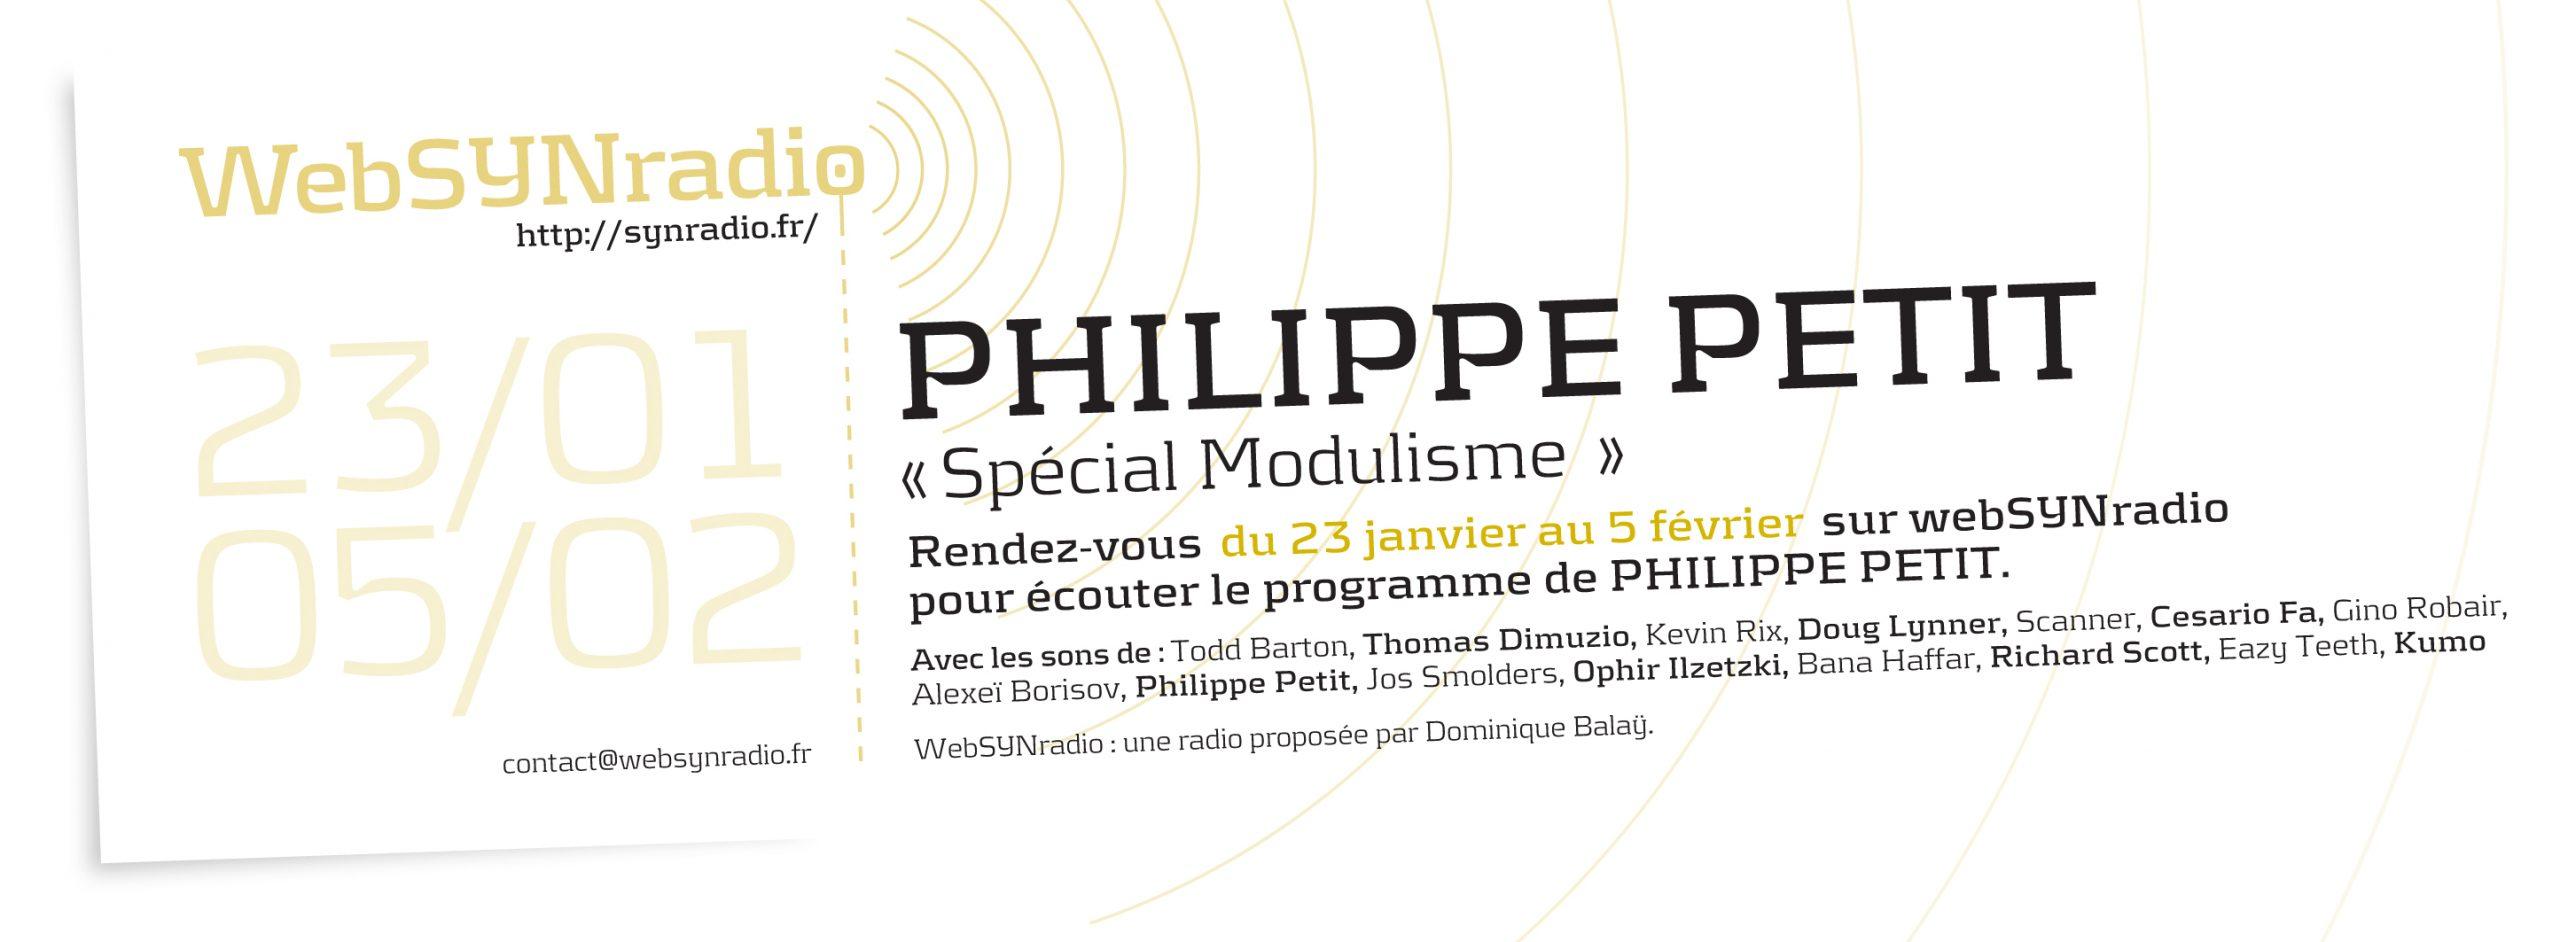 SYNradio-modulisme-Philippe-PETIT